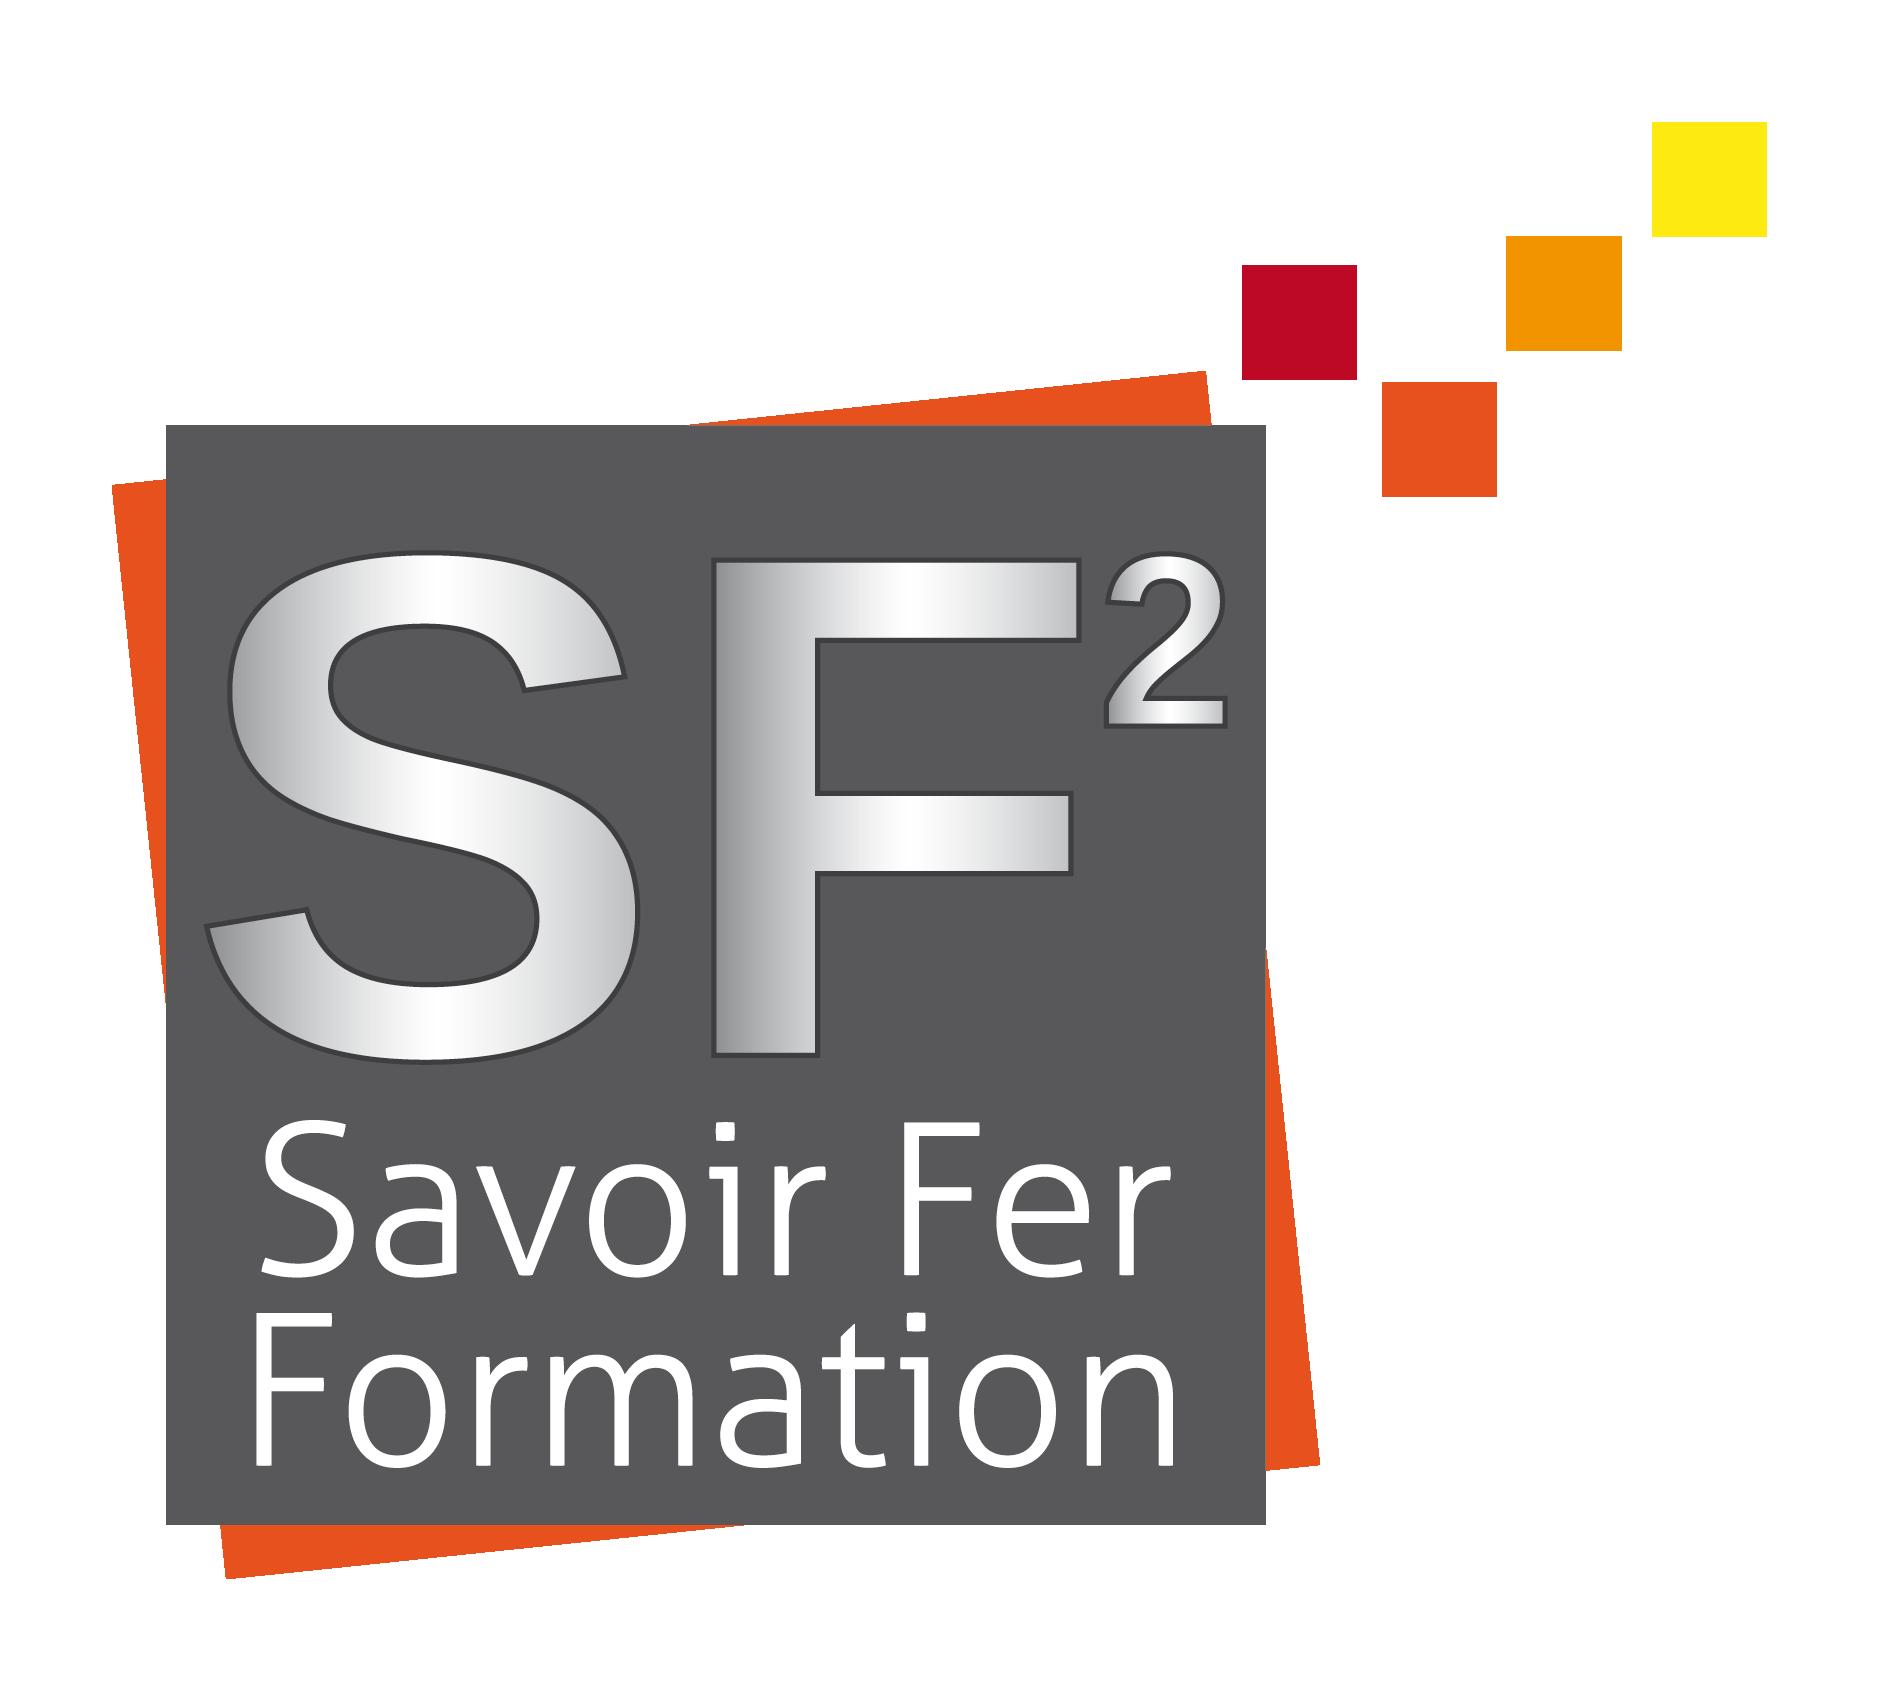 Le logo Savoir Fer Formation